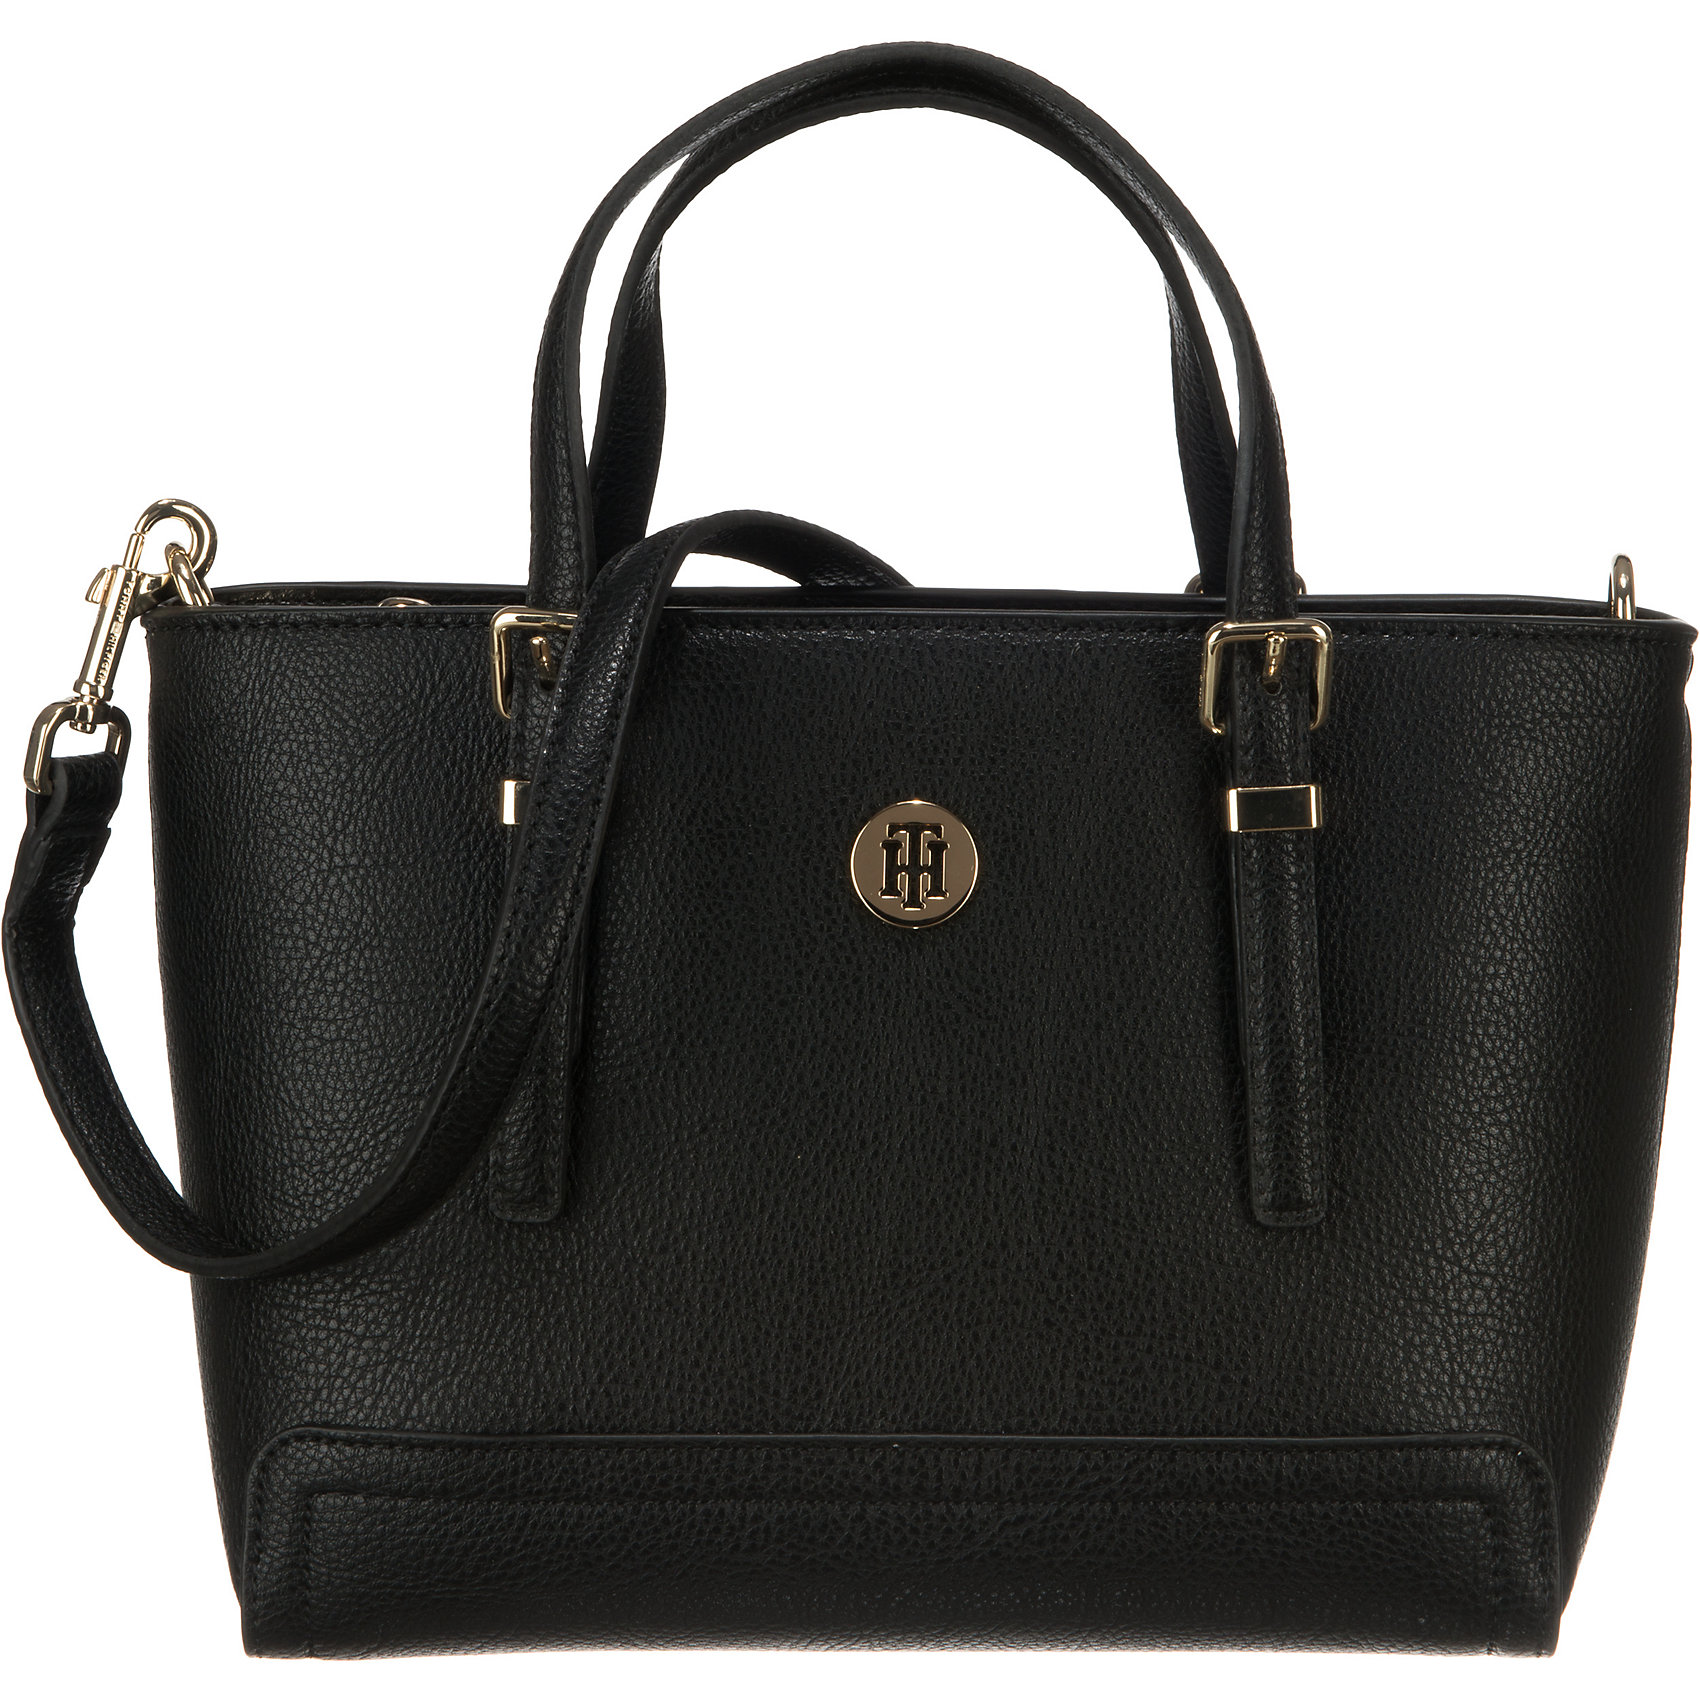 Neu TOMMY HILFIGER Honey Finegrain Finegrain Finegrain Small Handtasche 10417622 für Damen      Verkauf Online-Shop    Online Kaufen    Clearance Sale  013d67